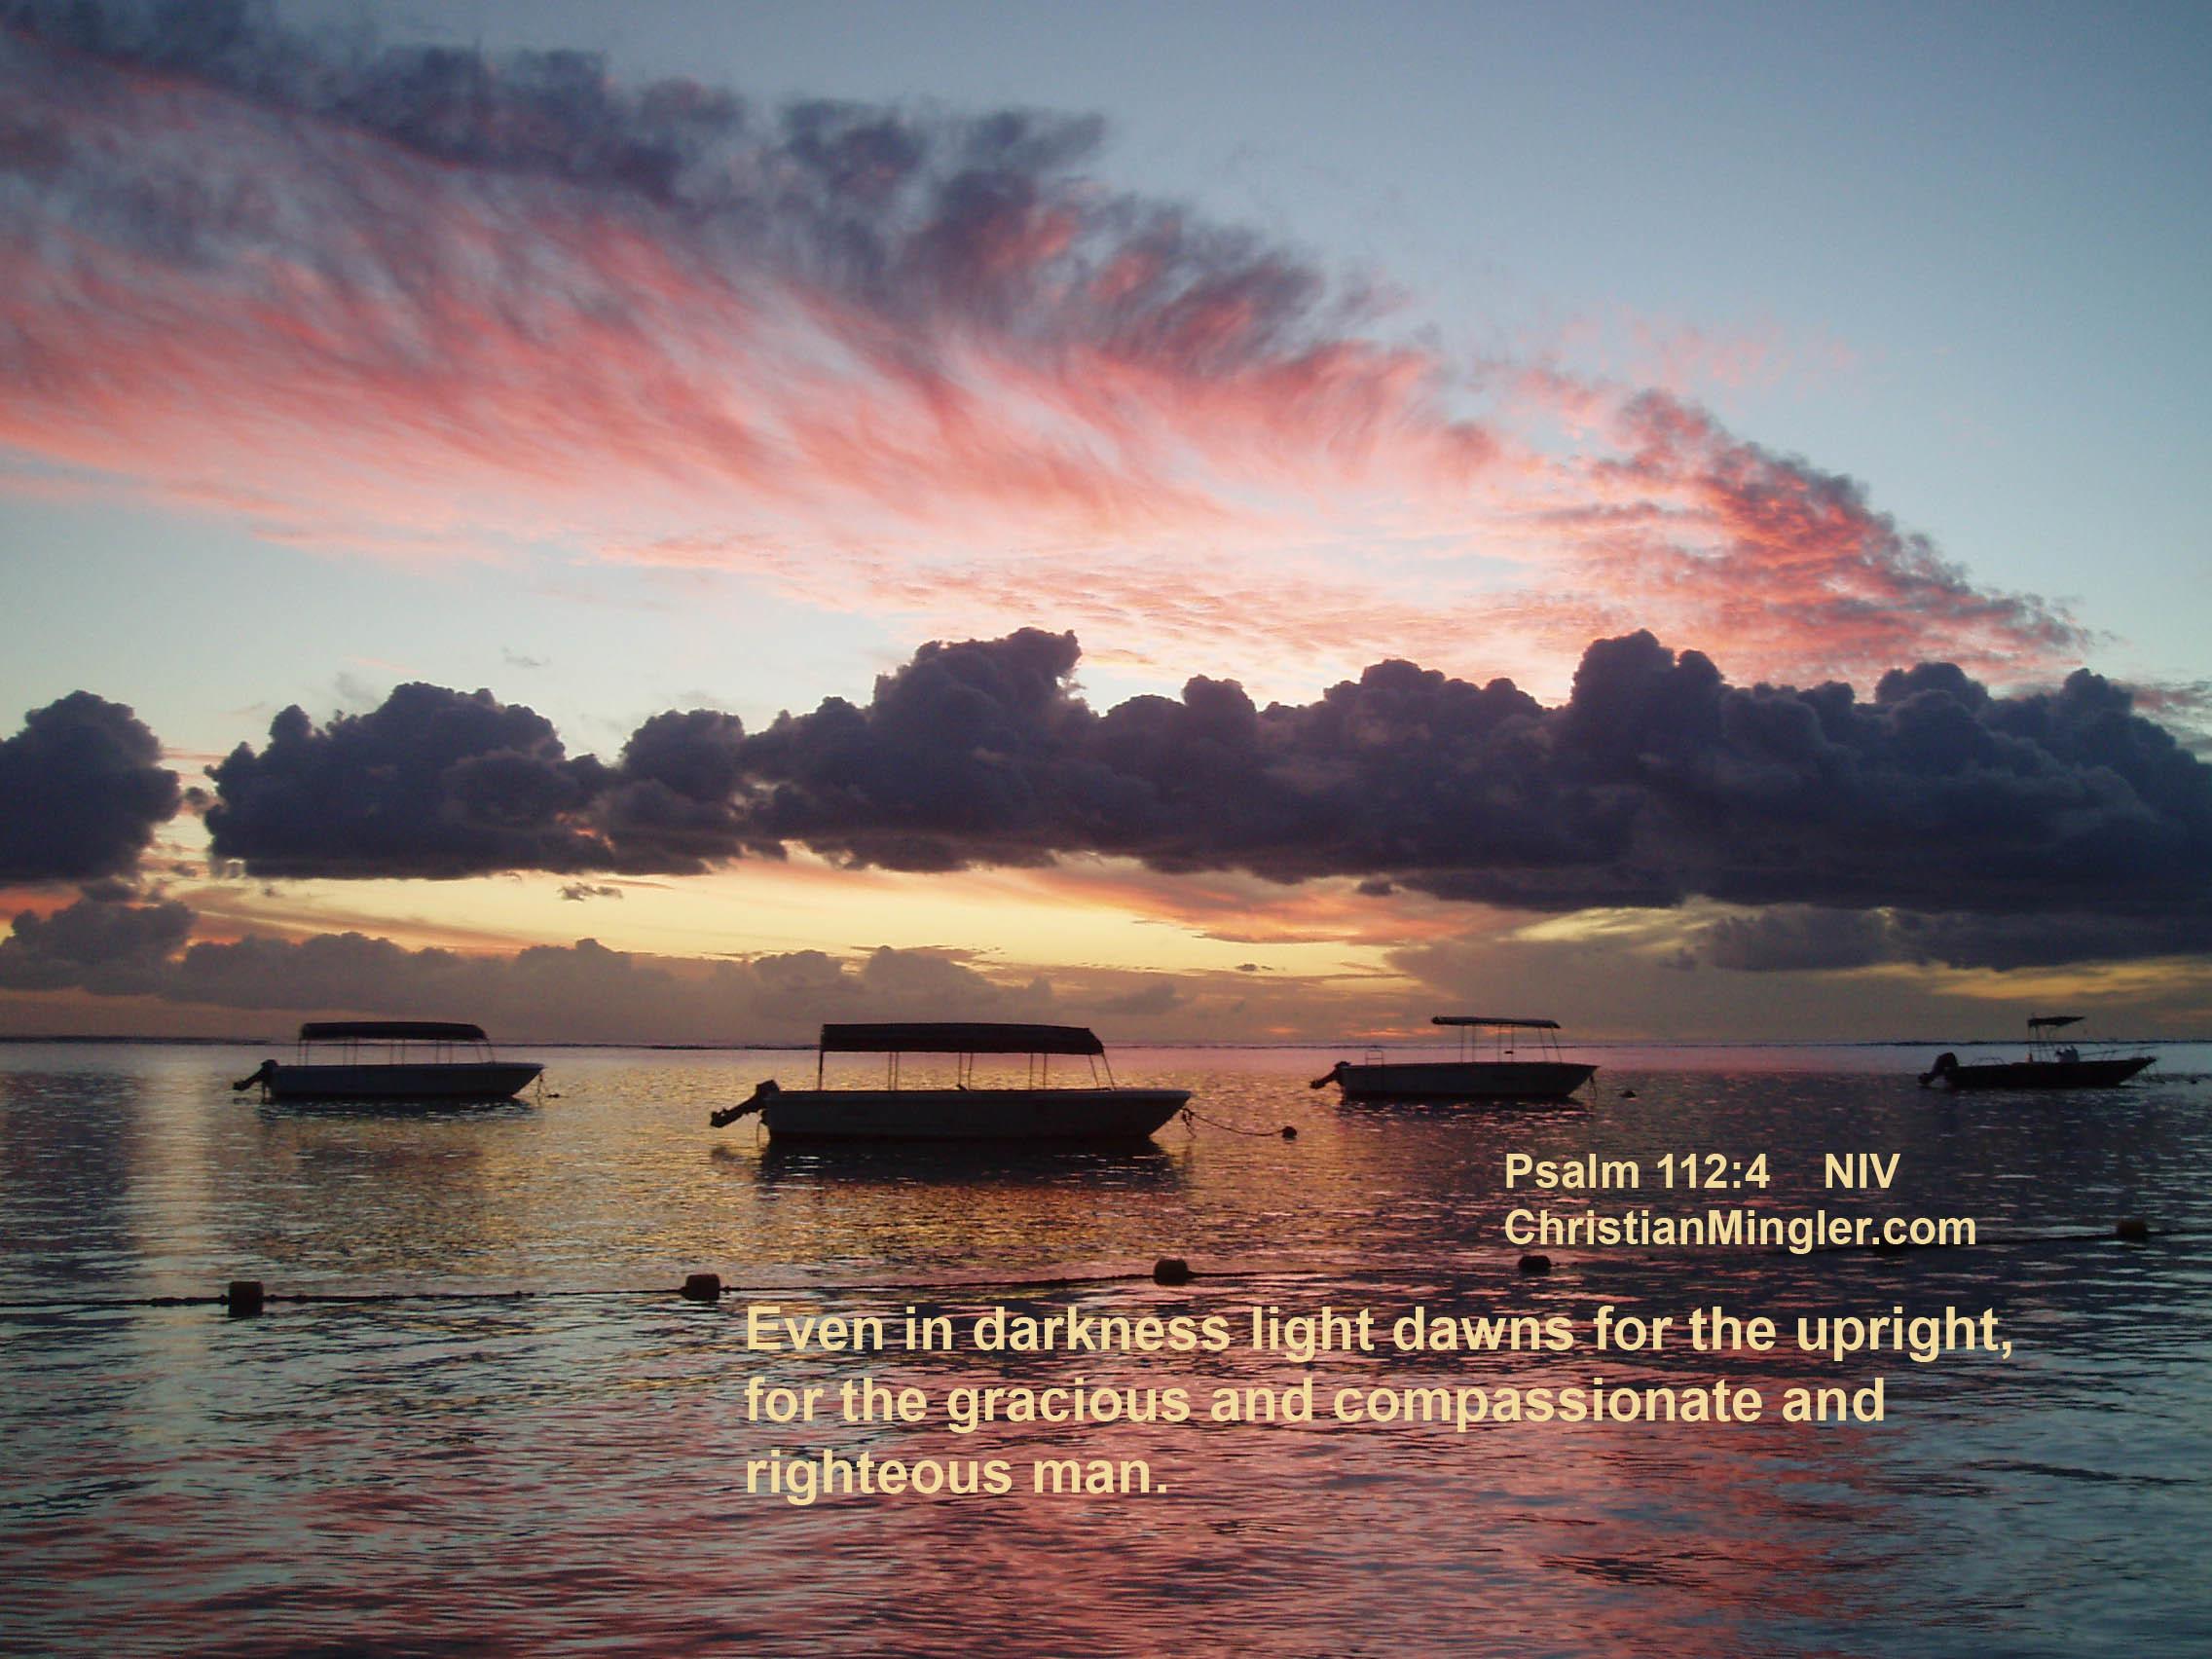 background sunset christian mauritius psalm travel island cccooperagency spiritual wallpapertag ole bucketlist faith freeimages africa